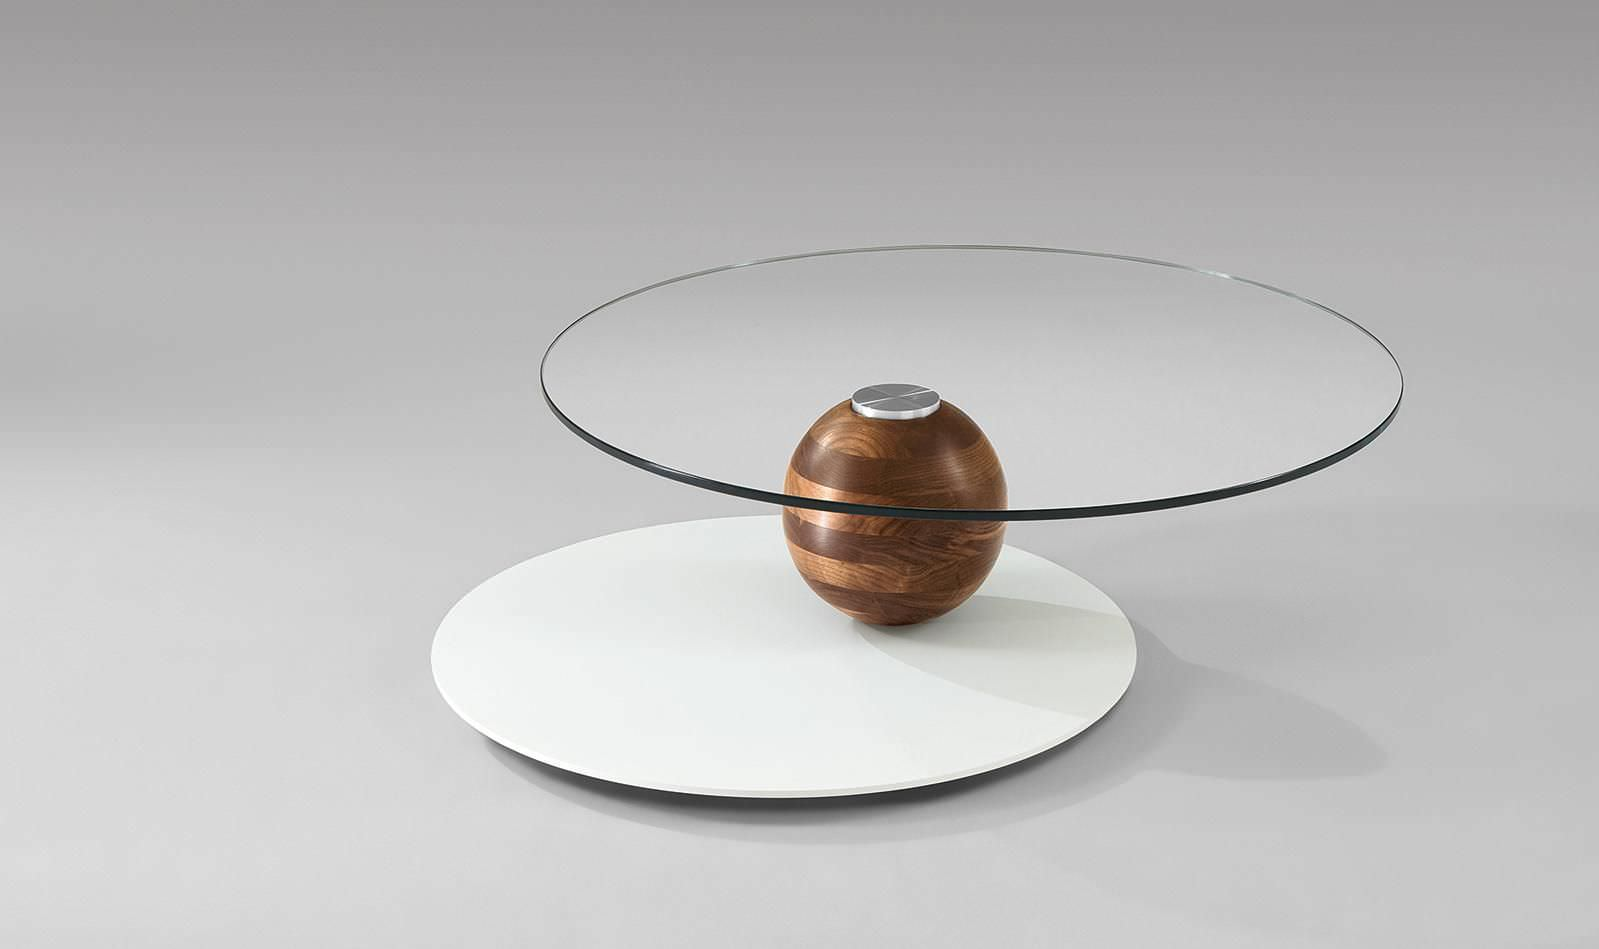 Moderner Couchtisch Holz Glas Rund 4317 Alfons Venjakob